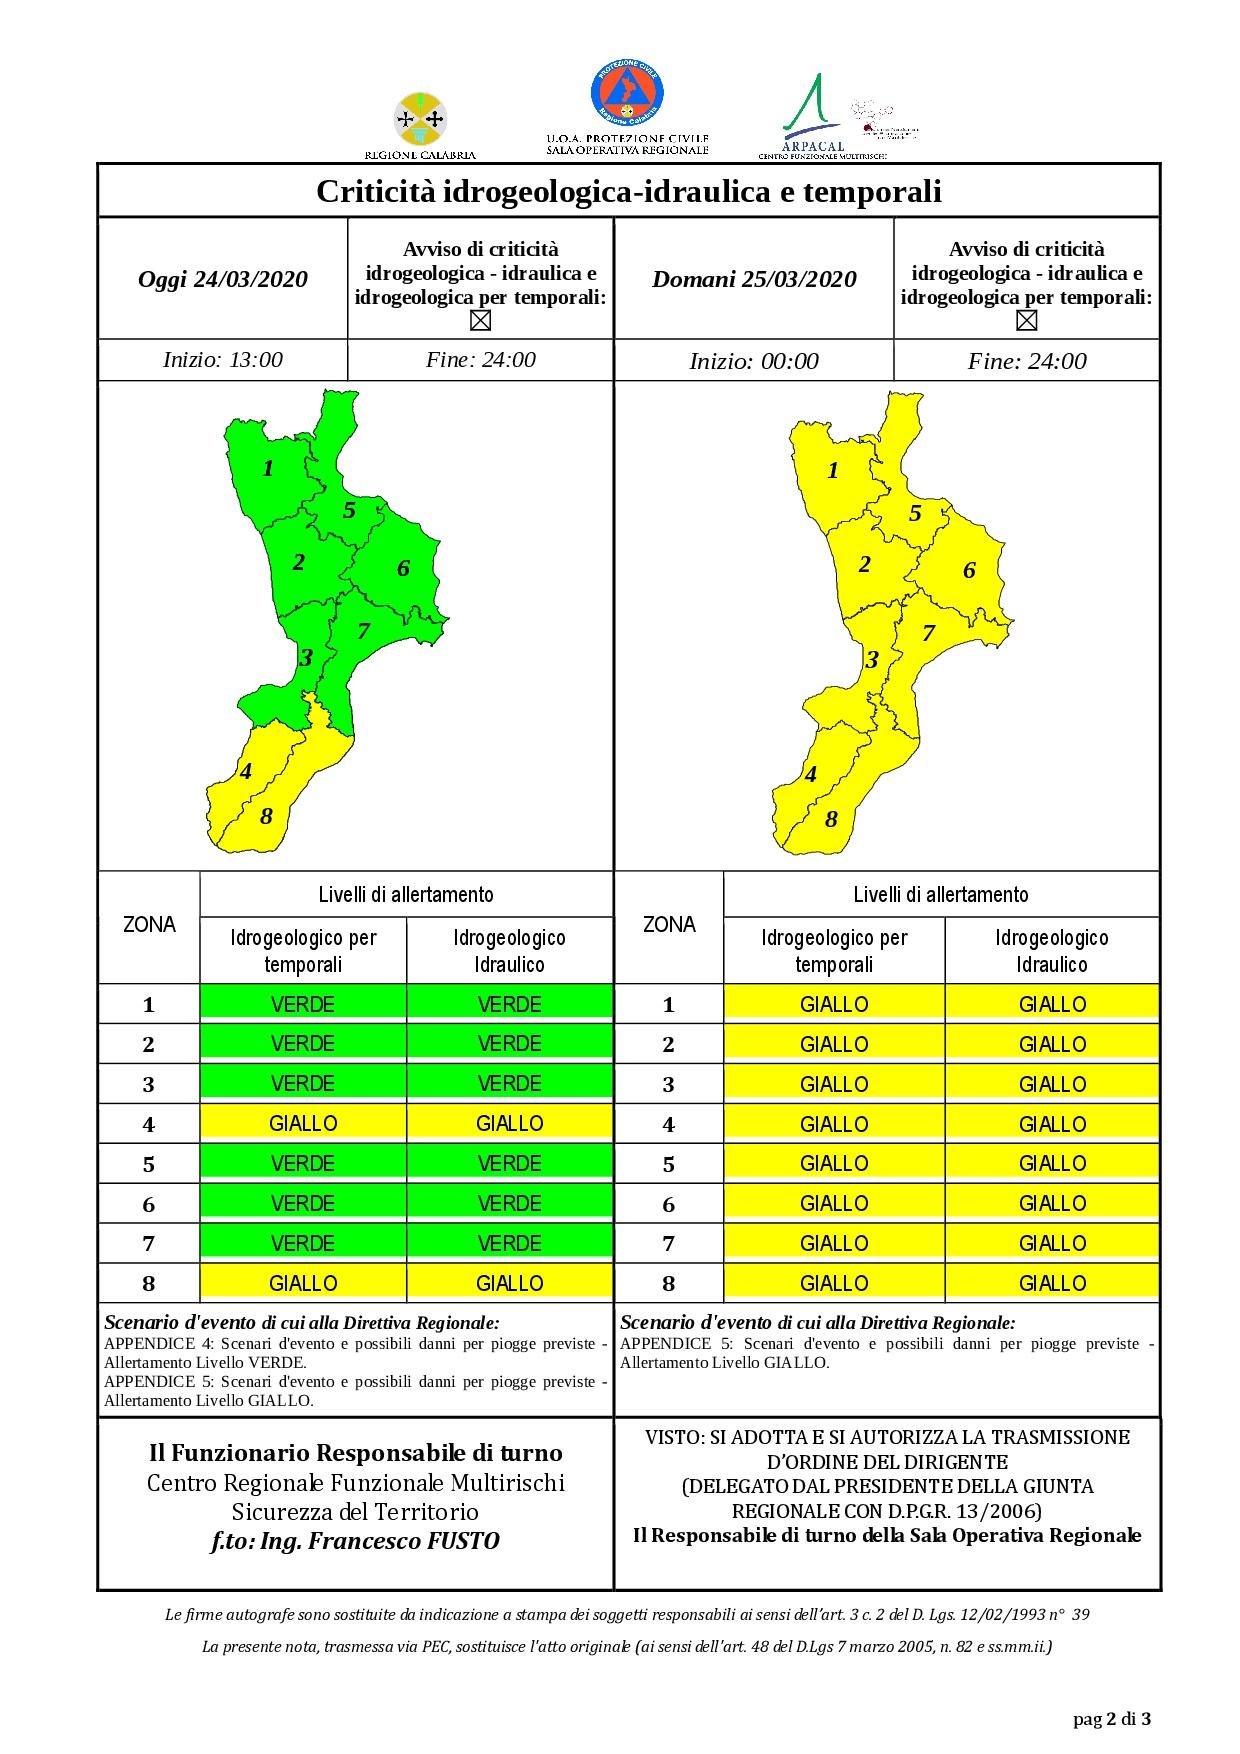 Criticità idrogeologica-idraulica e temporali in Calabria 24-03-2020